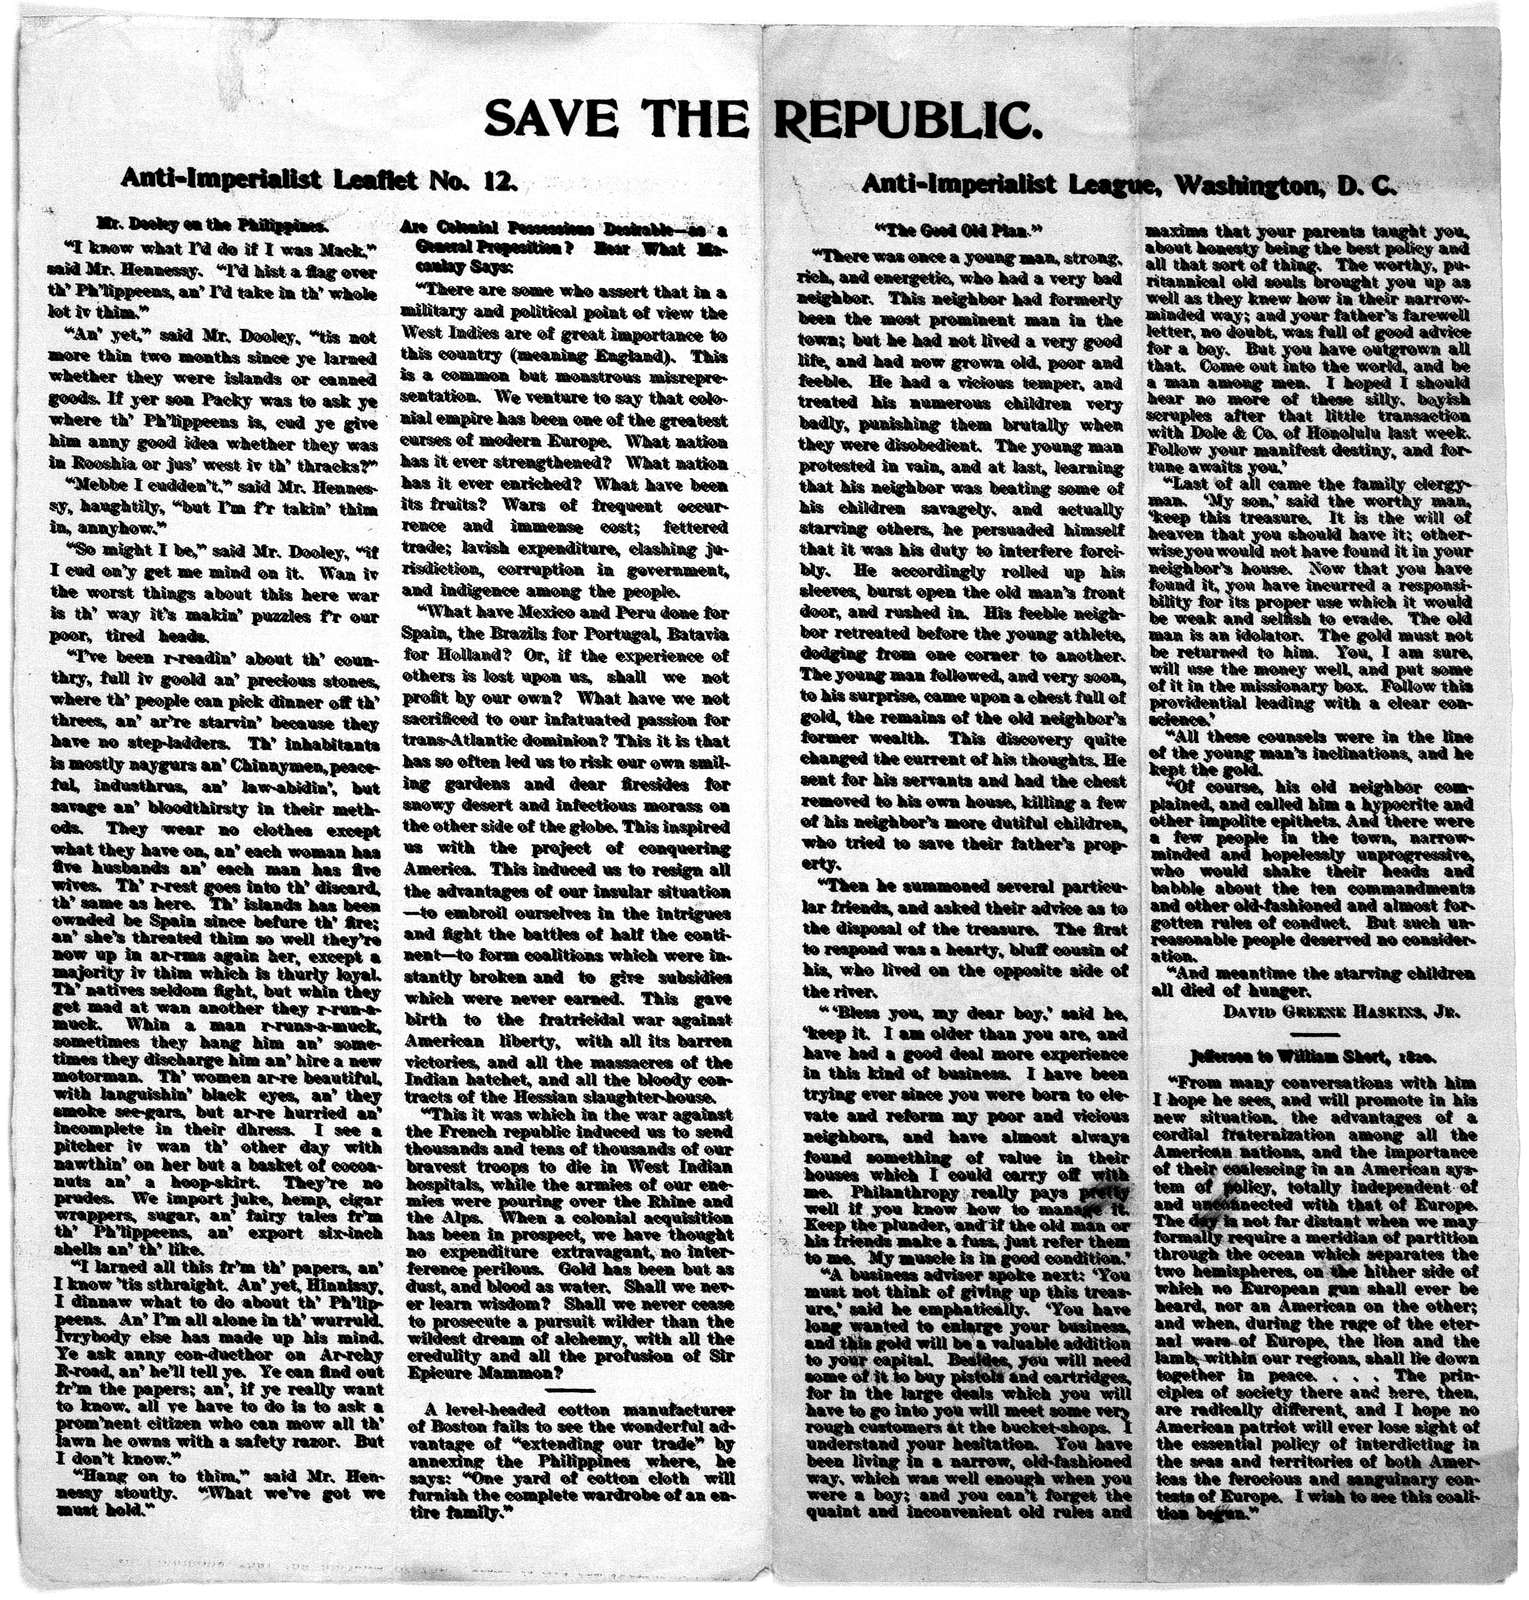 Save the republic. Anti-imperialist leaflet no. 11 [-21] [Washington, 1898-99].